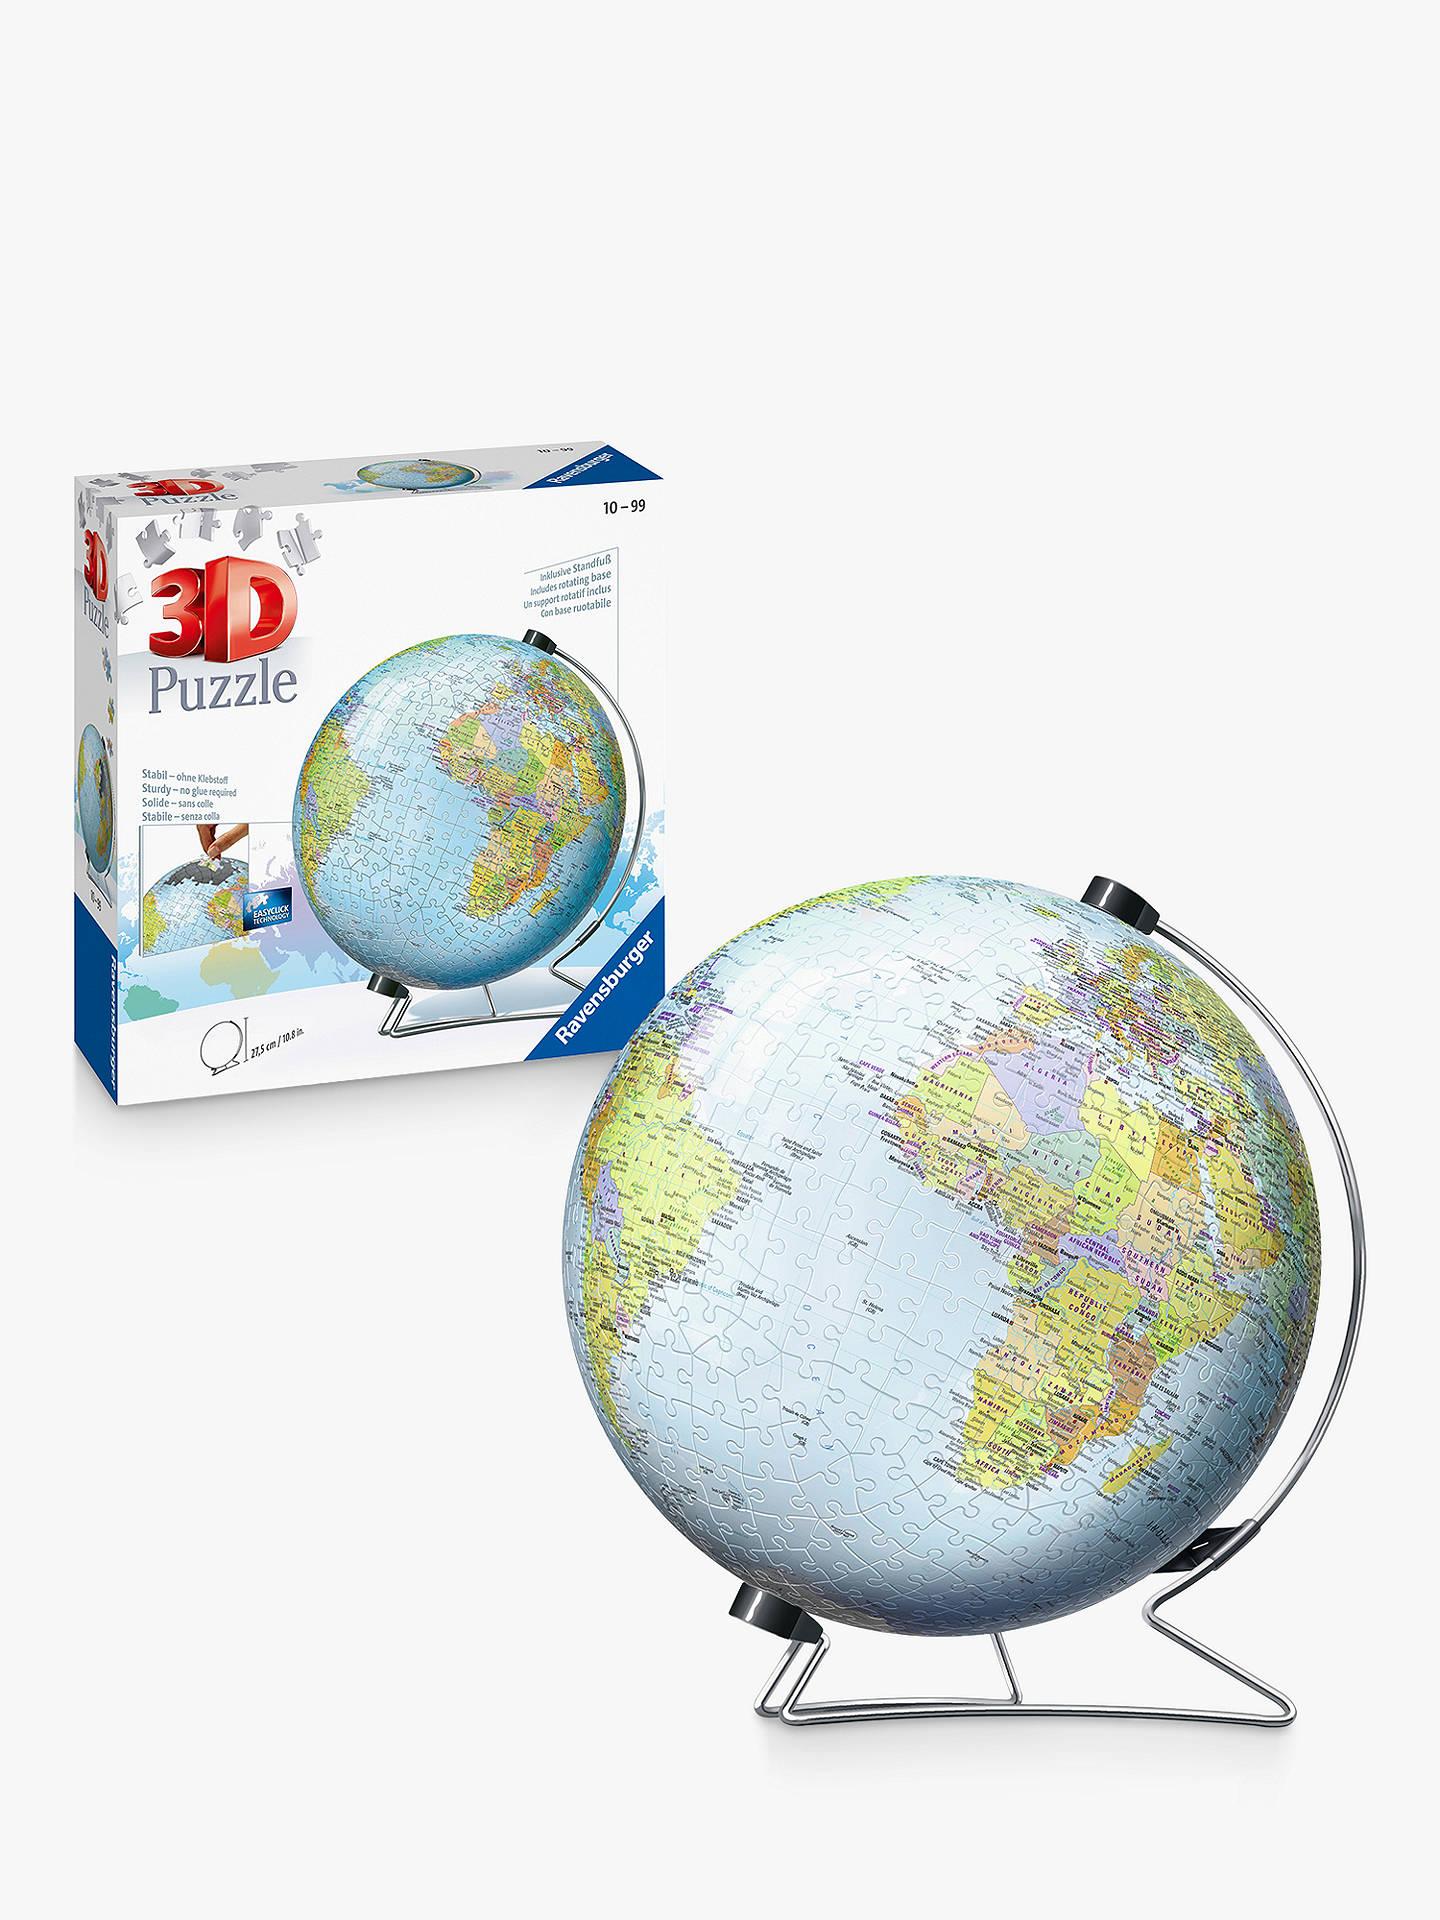 Ravensburger The World 3D Jigsaw Puzzle, 540 Pieces